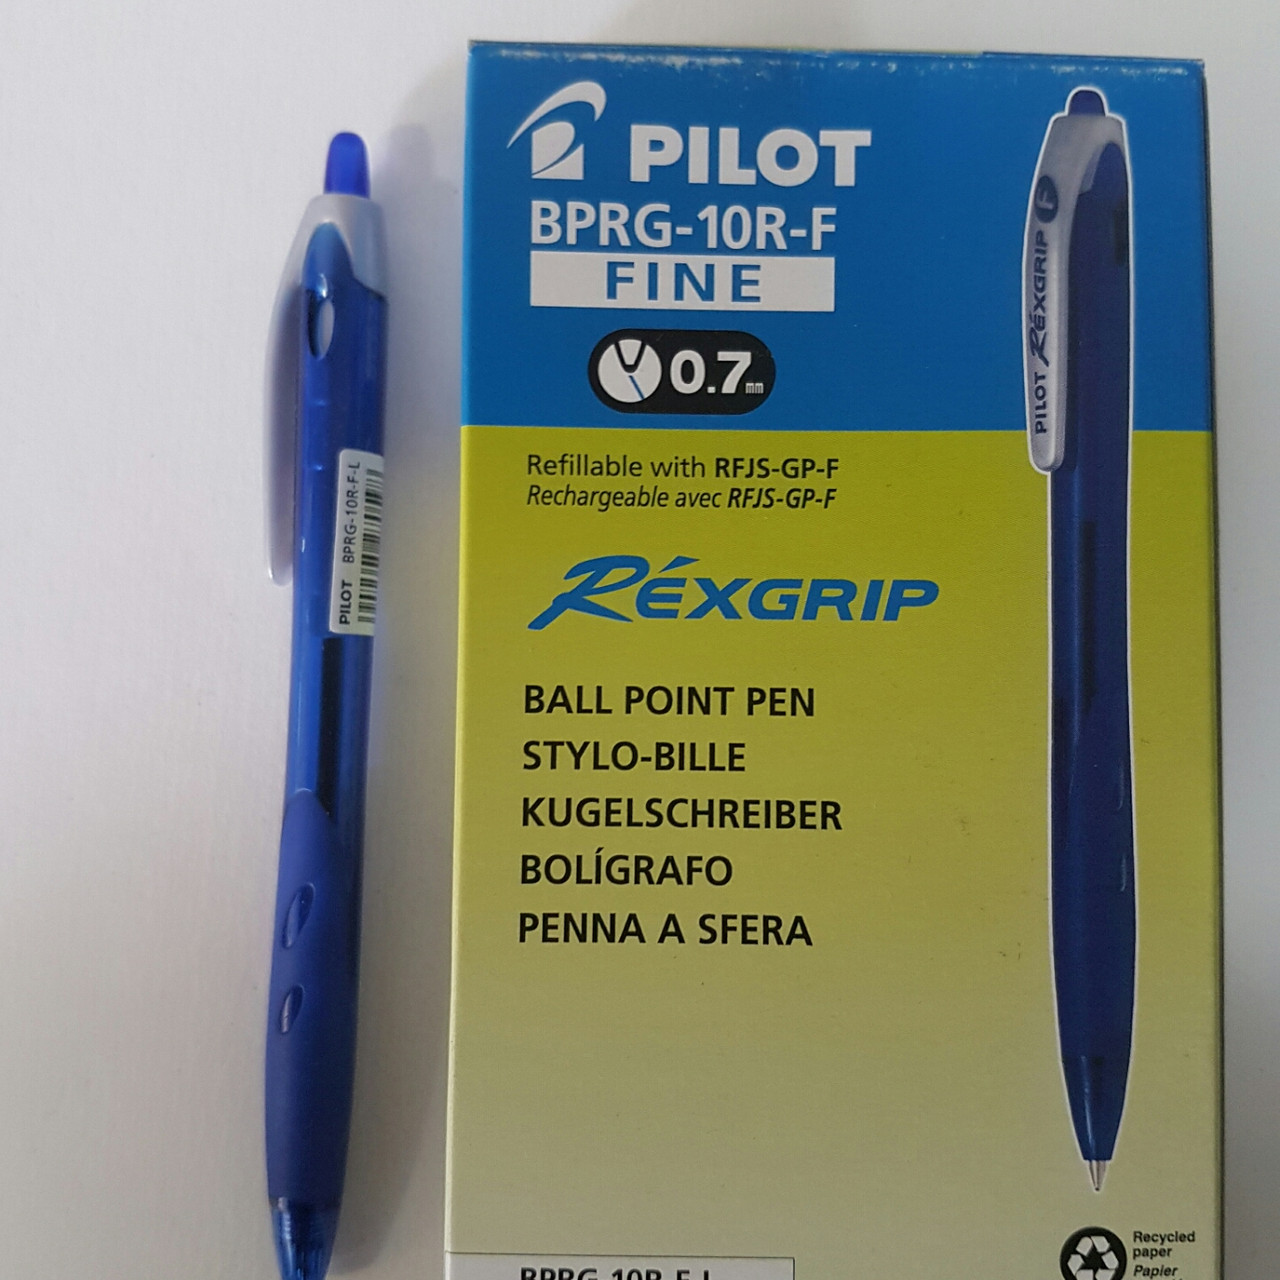 PILOT BPRG-10R-F